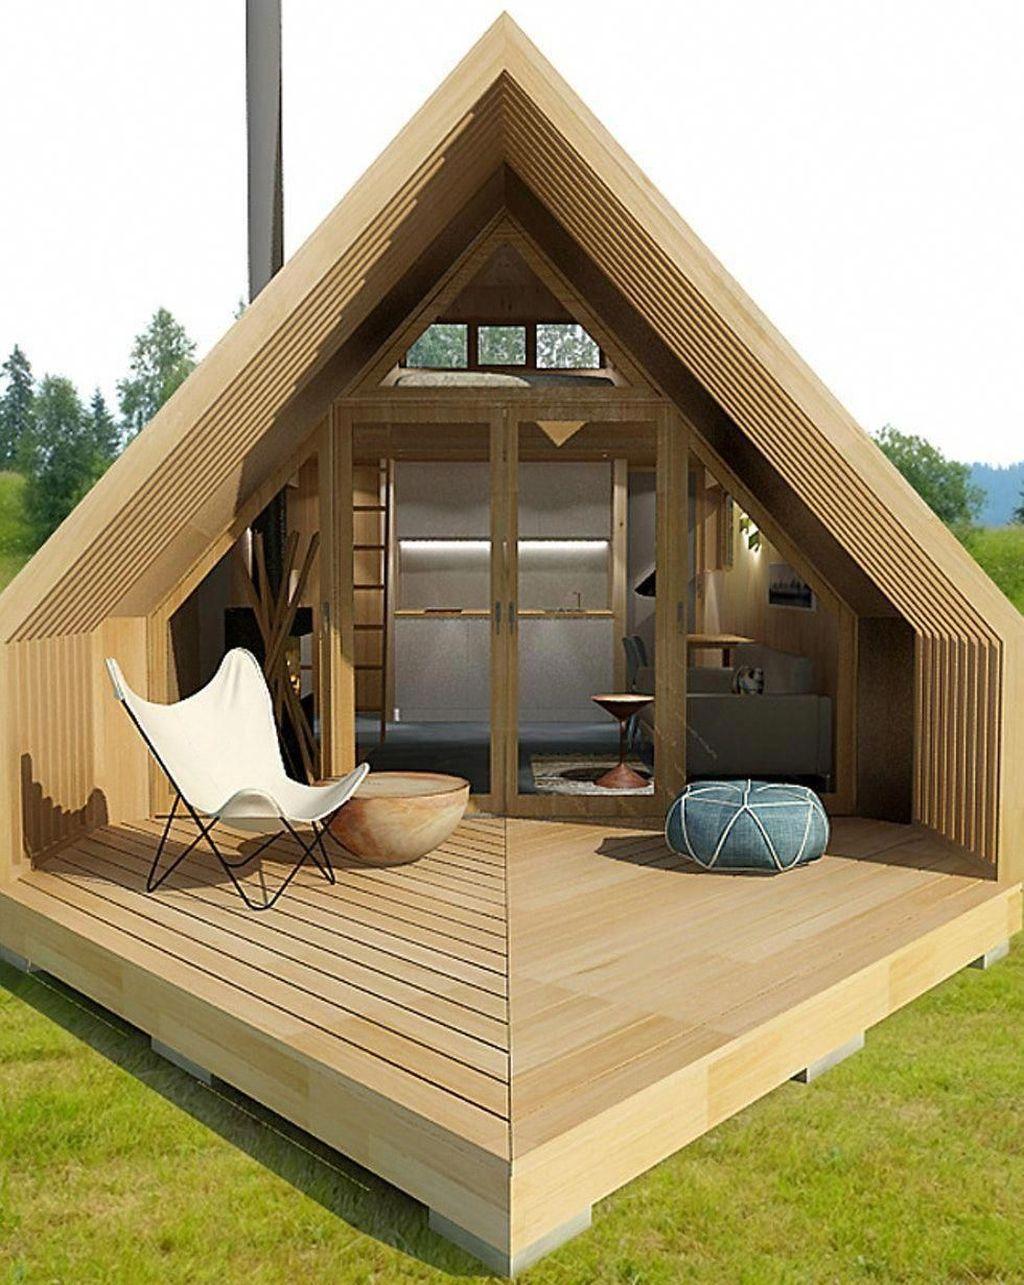 Amazing Rustic Tiny House Design Ideas 28